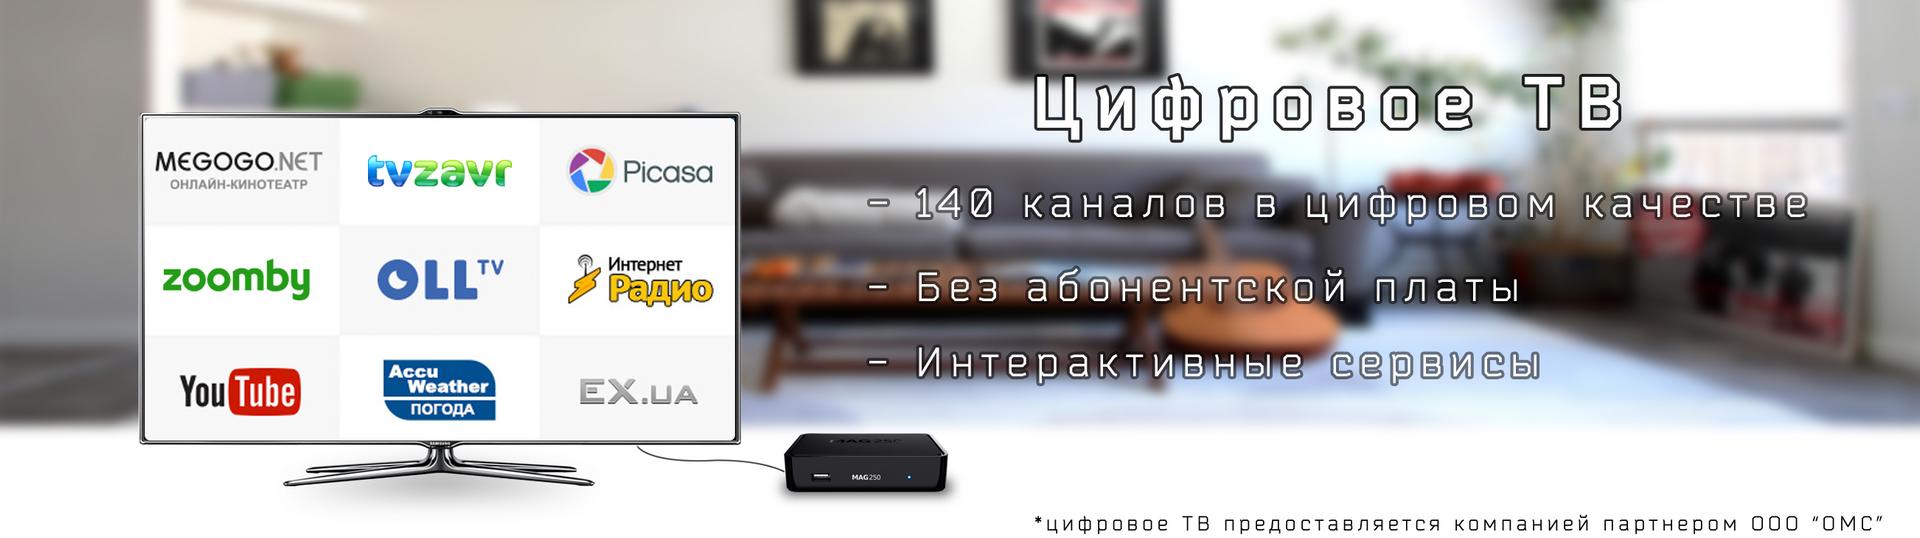 banner_tv21